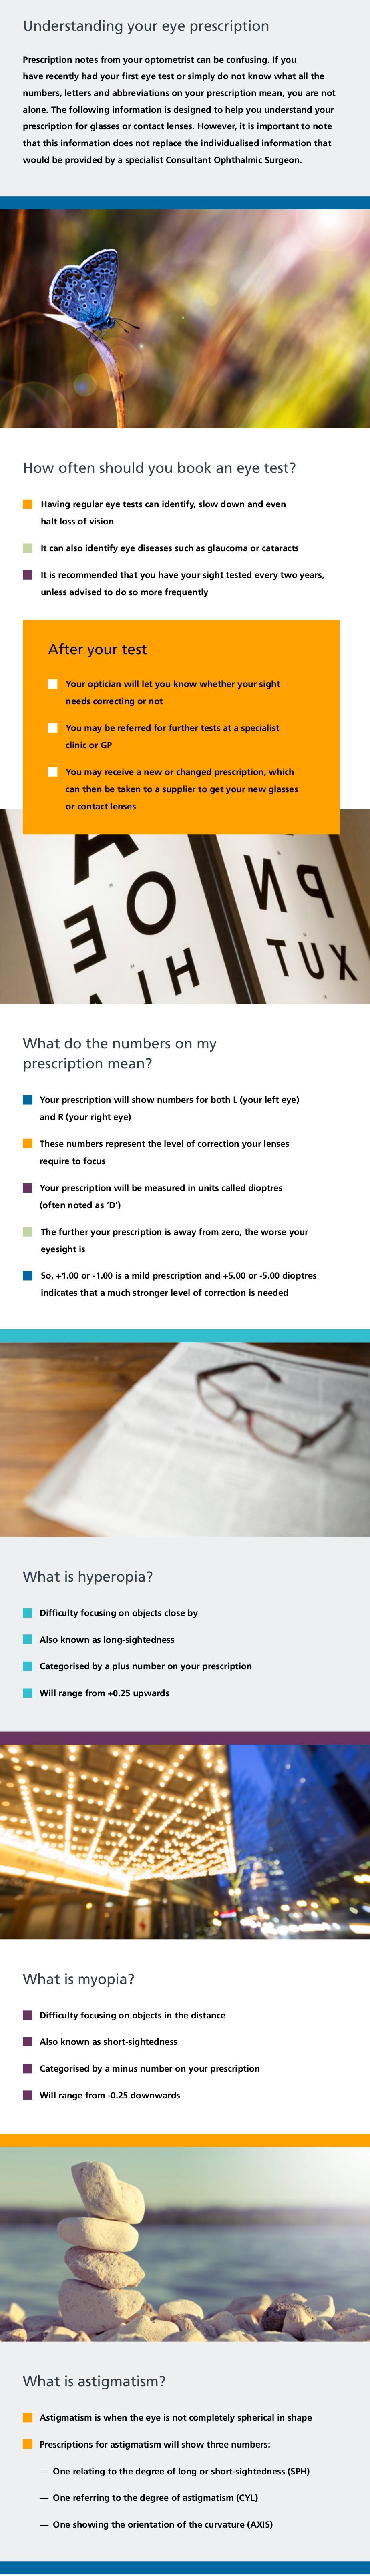 33509_consumer-blog-eye-understanding-your-eye-prescription.jpeg